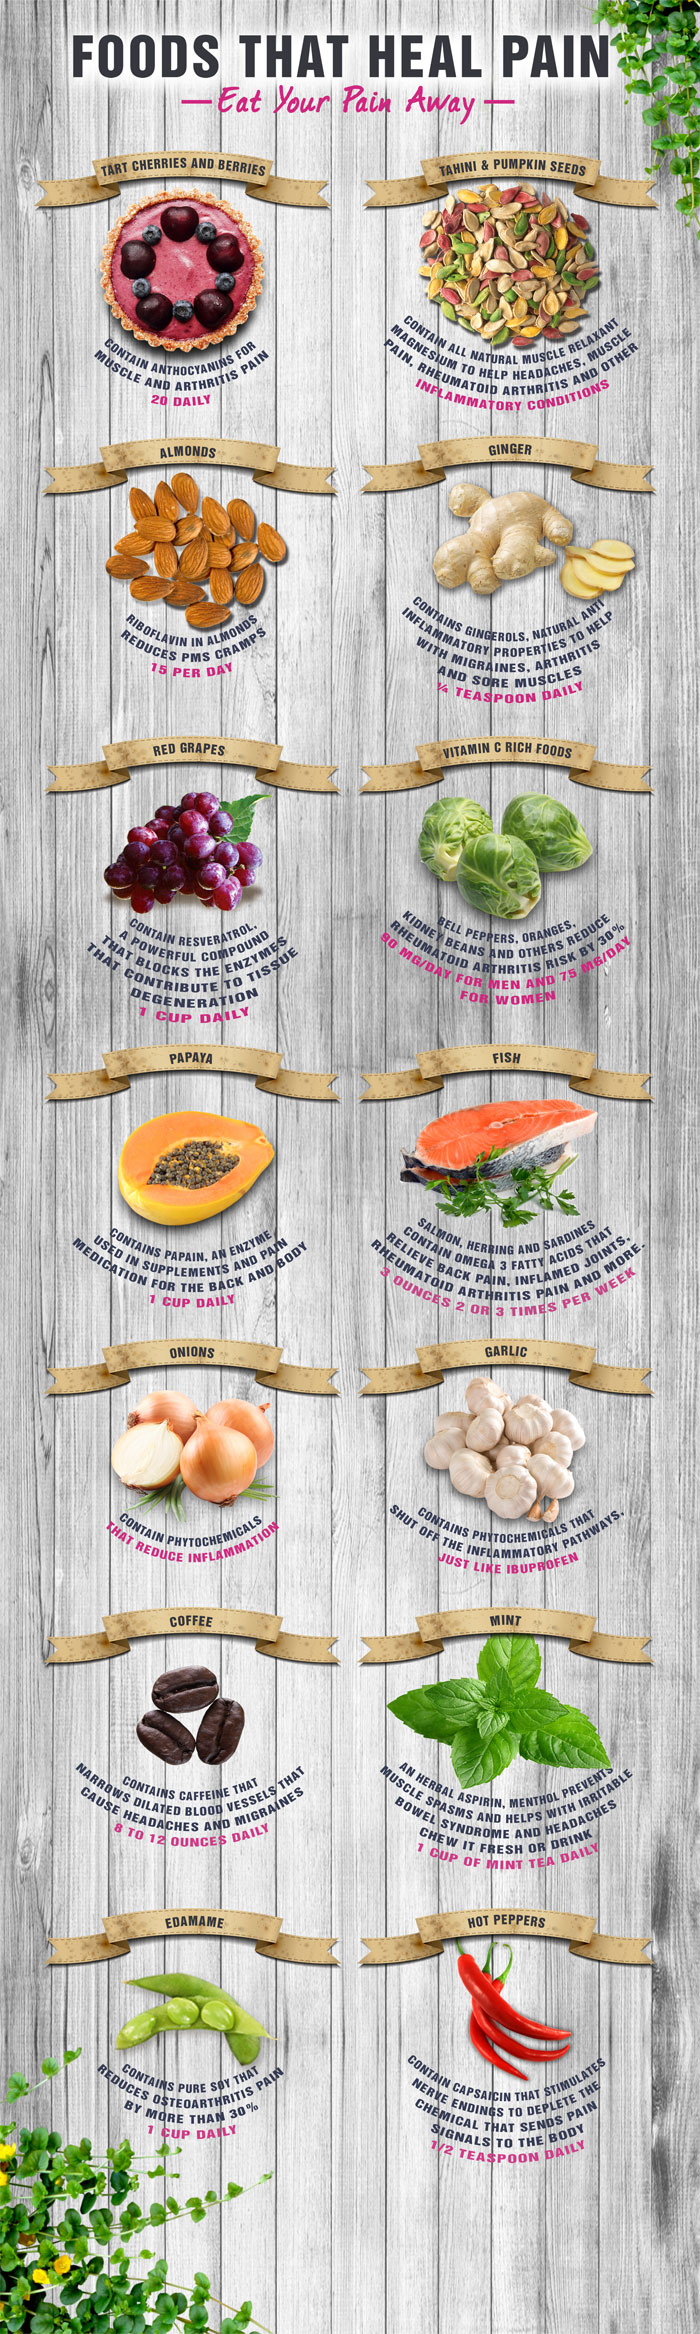 pain-fighting-foods